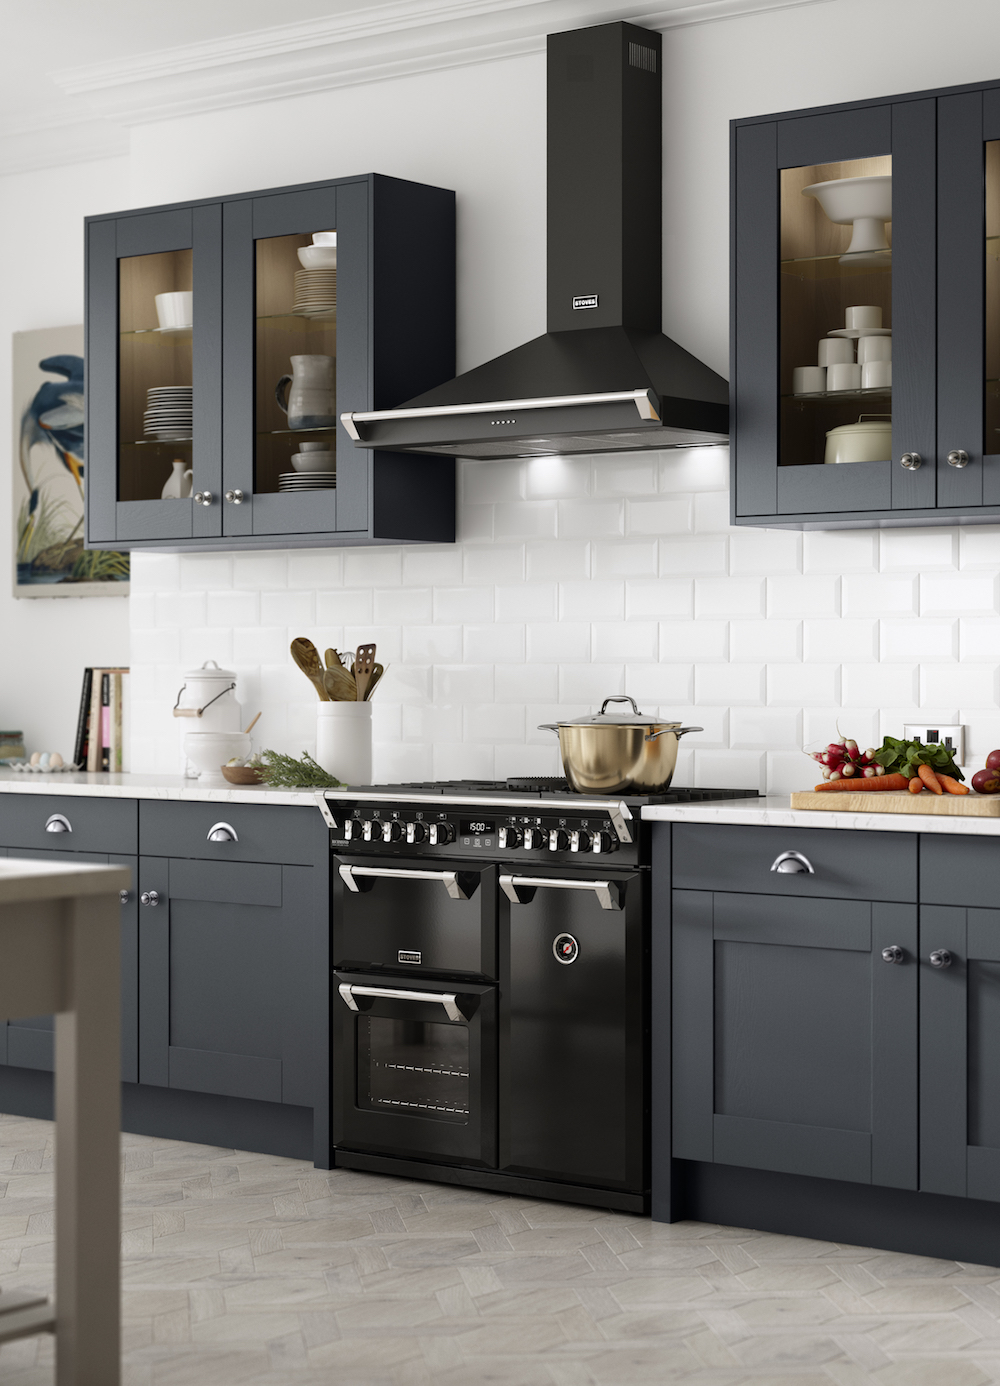 Stoves Richmond fornuis met afzuigkap met landelijke uitstraling #stoves #fornuis #keuken #keukeninspiratie